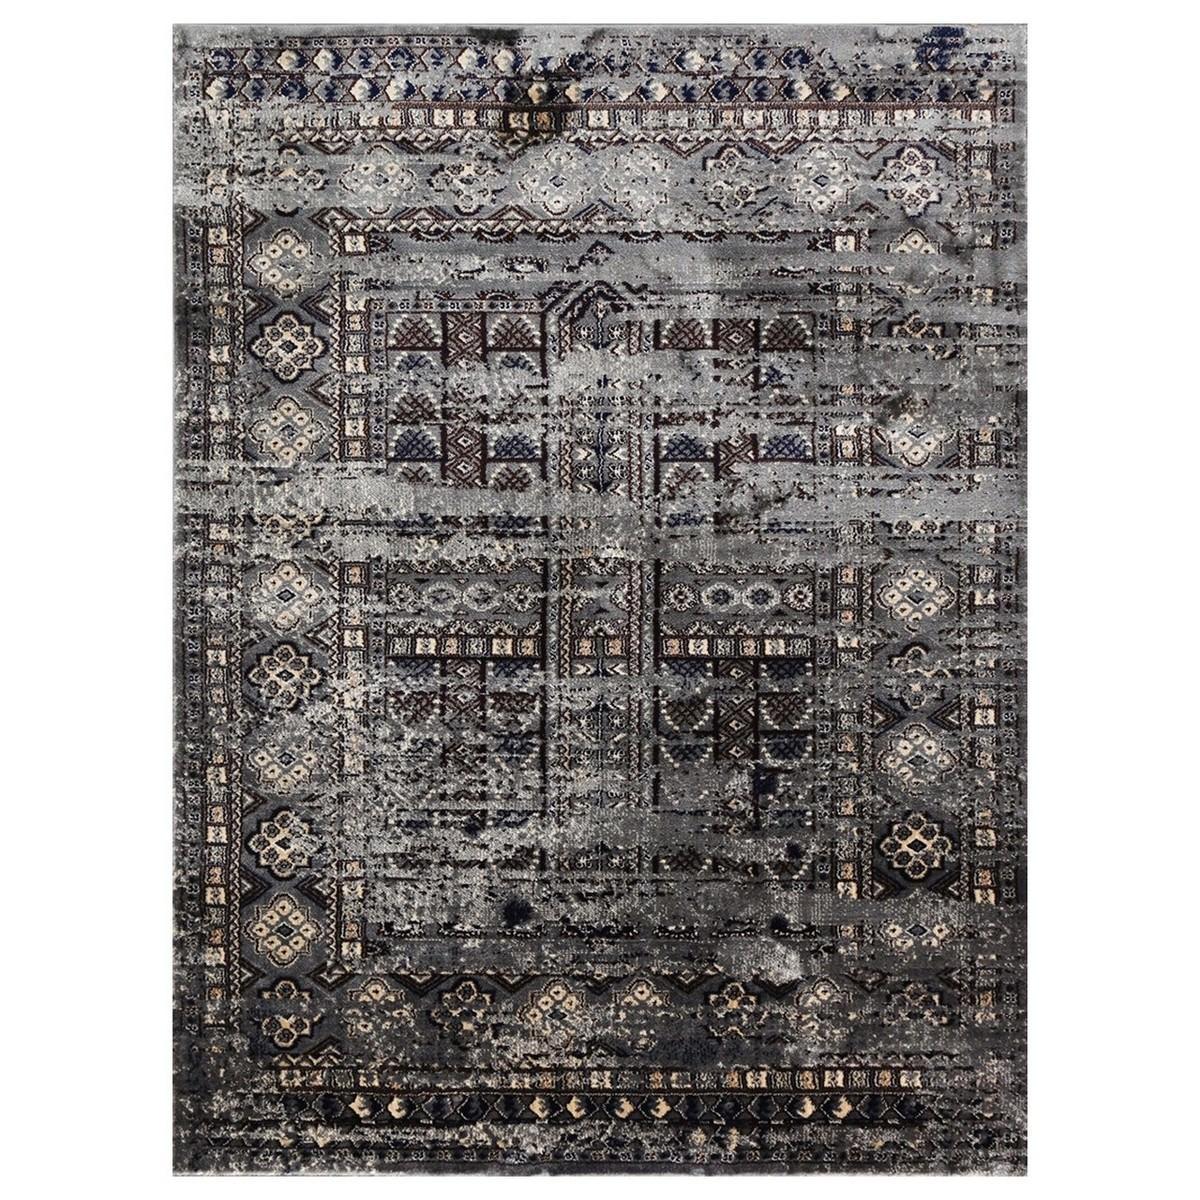 Artifact Ziba Distressed Oriental Rug, 240x330cm